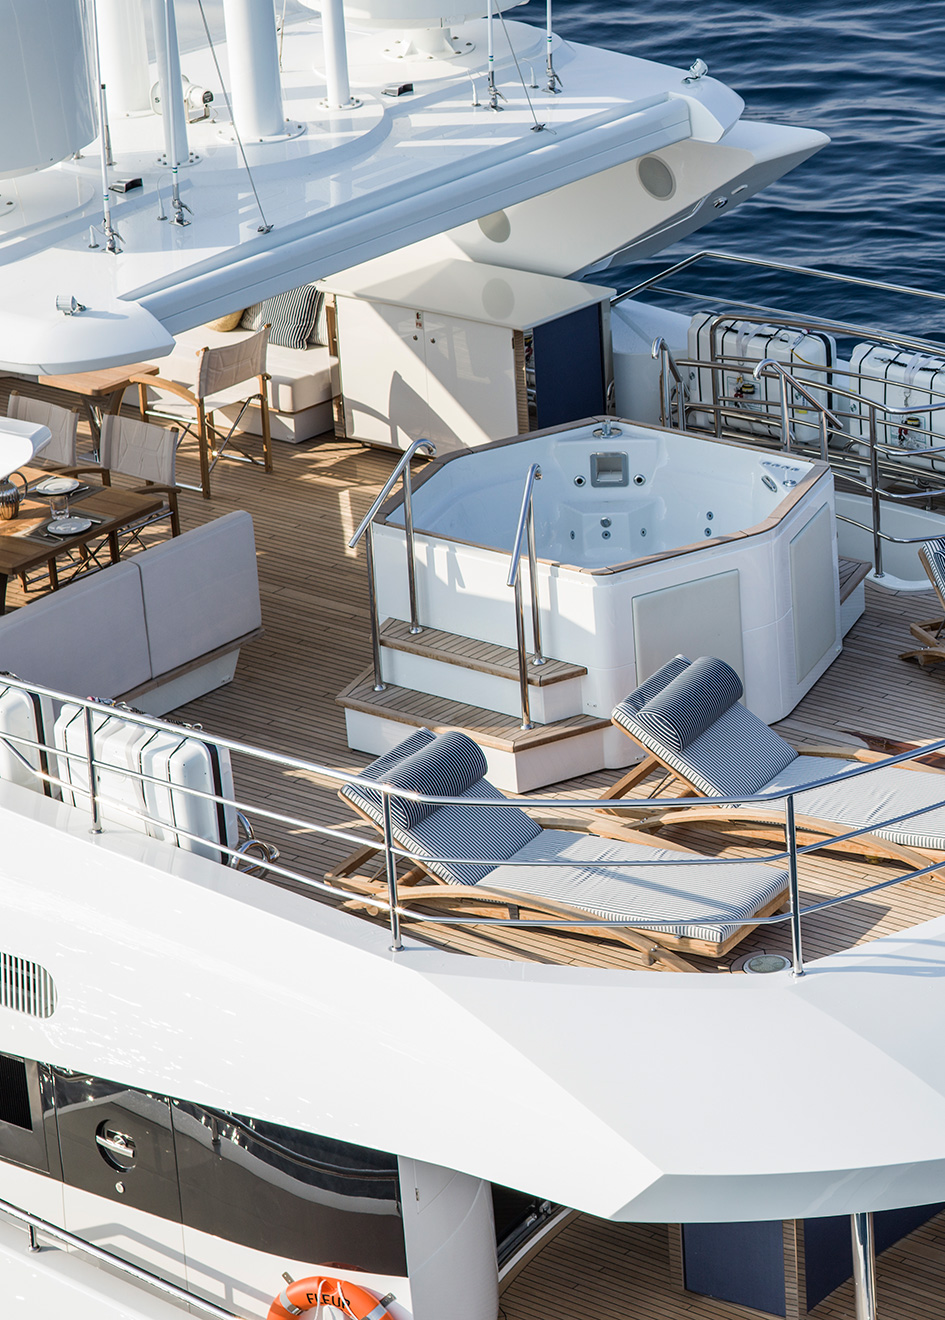 the-sundeck-of-the-sunseeker-116-yacht-fleur-credit-mike-jones-waterline-media